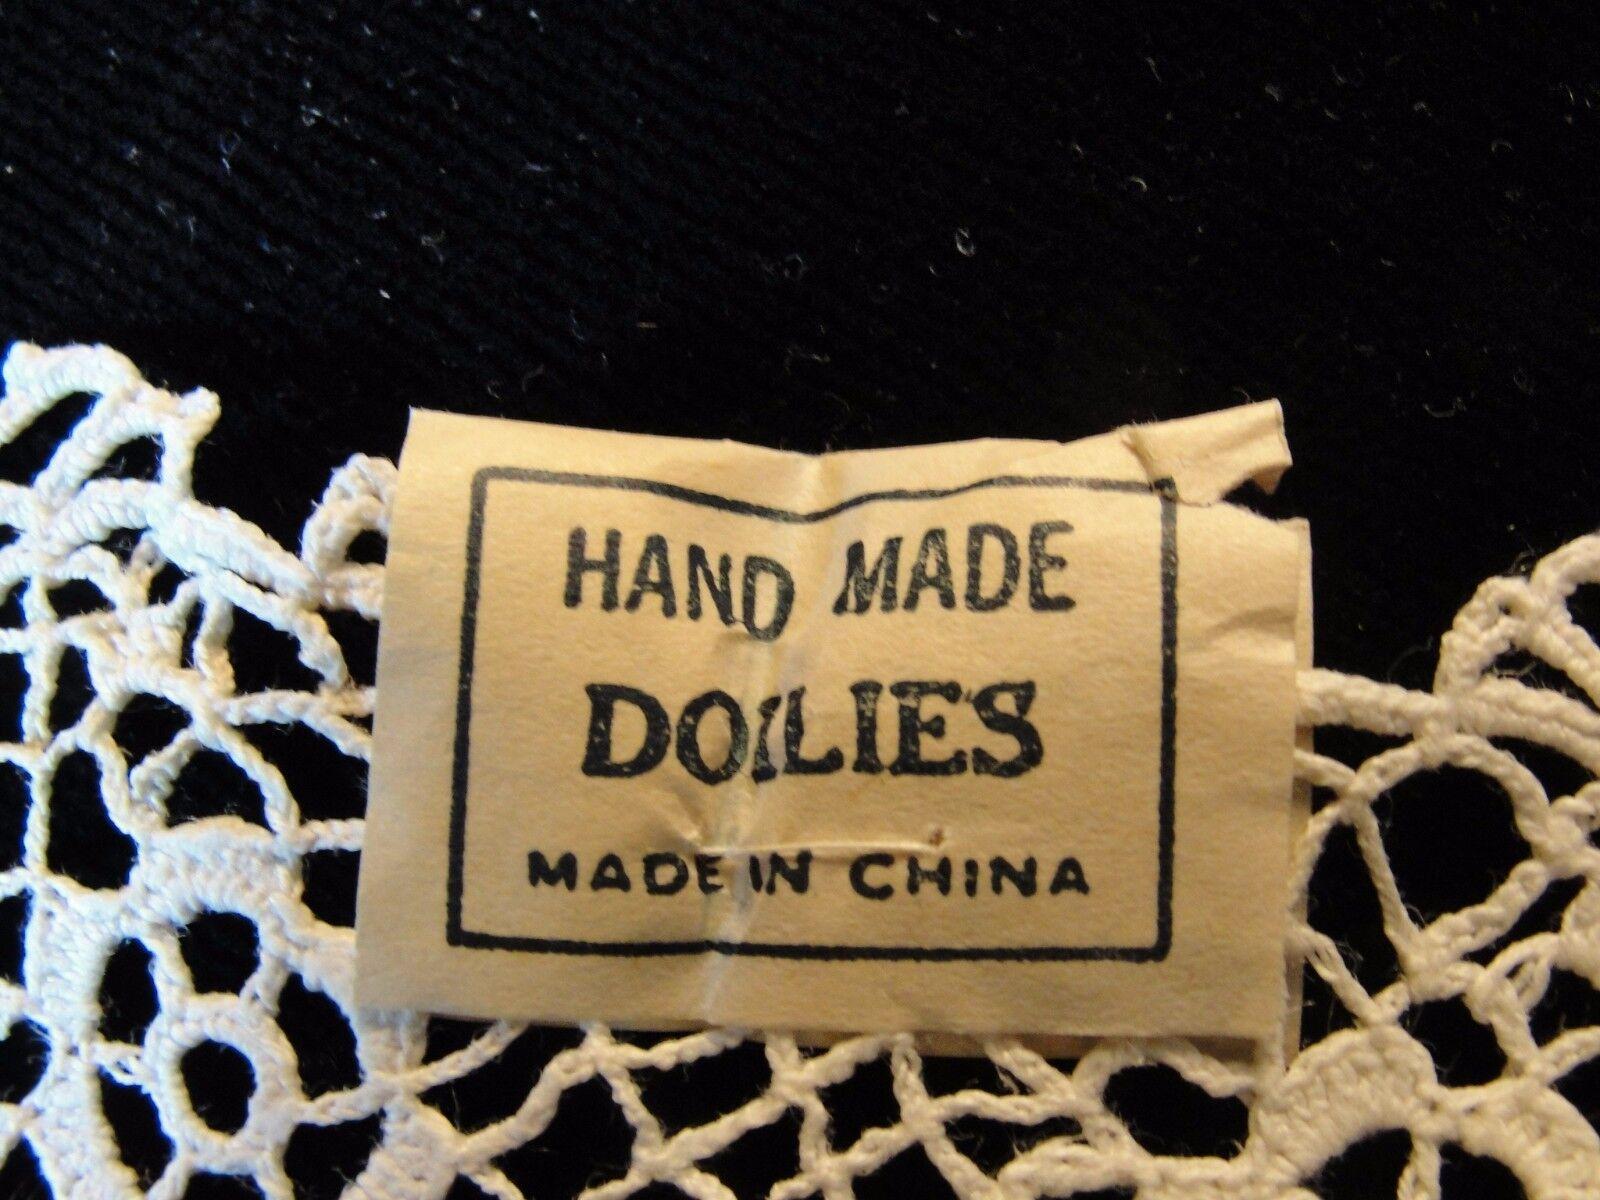 Купить 12 VTG 5 1/2-6 HAND MADE COTTON LACE DOILIES NEW OLD STOCK 1940'S ONE DOZEN